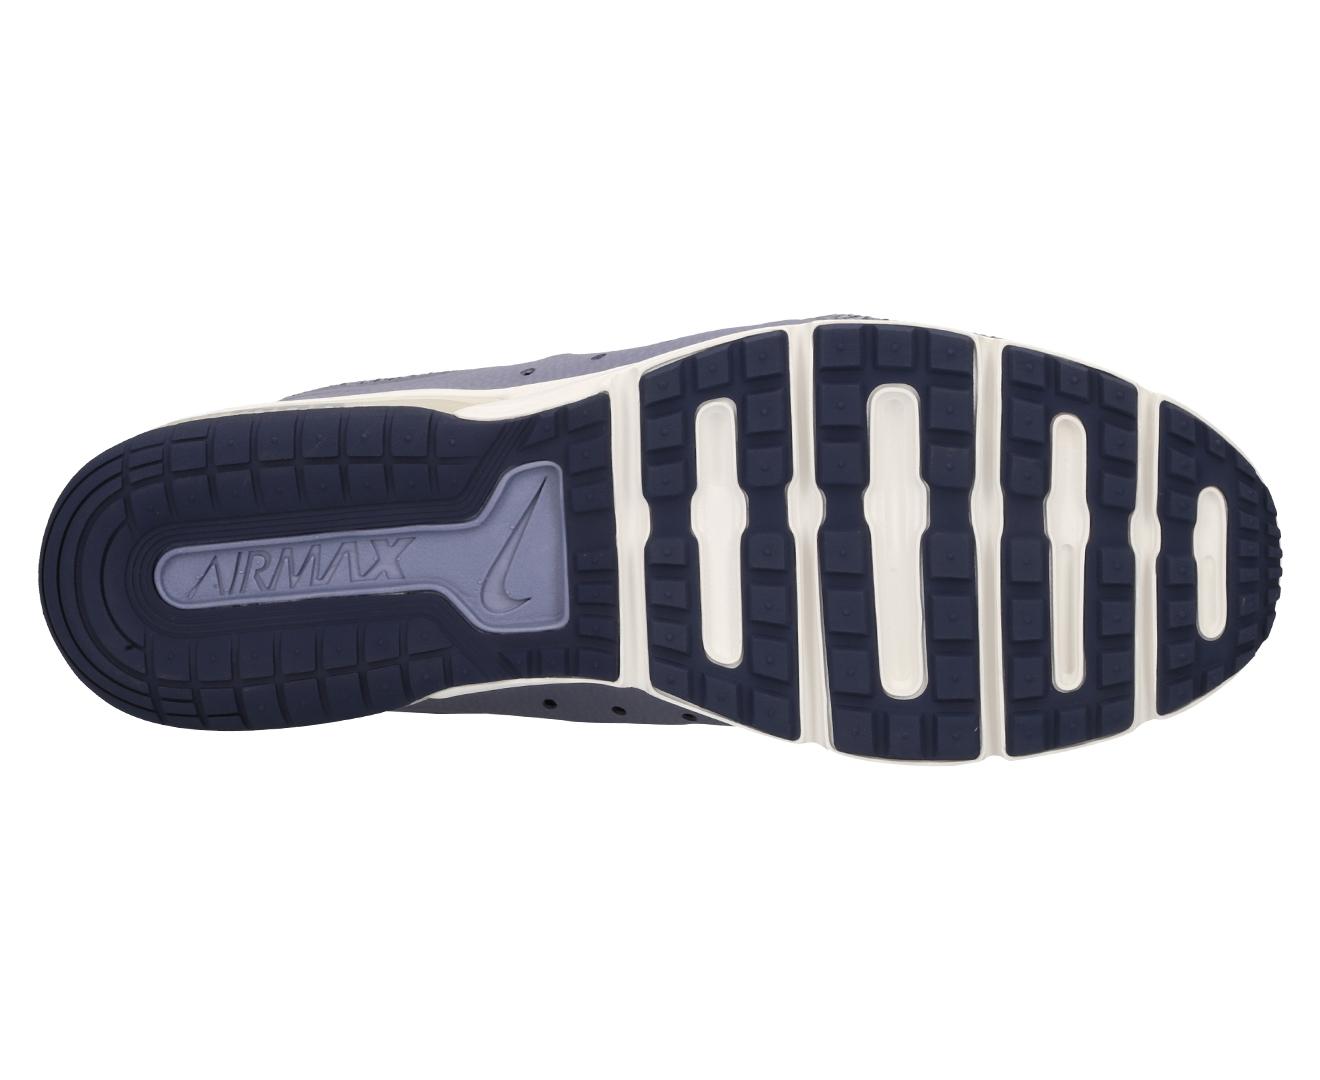 100% authentic c1146 effee Nike Men s Air Max Sequent 3 Shoe - Obsidian Summit White   Catch.com.au